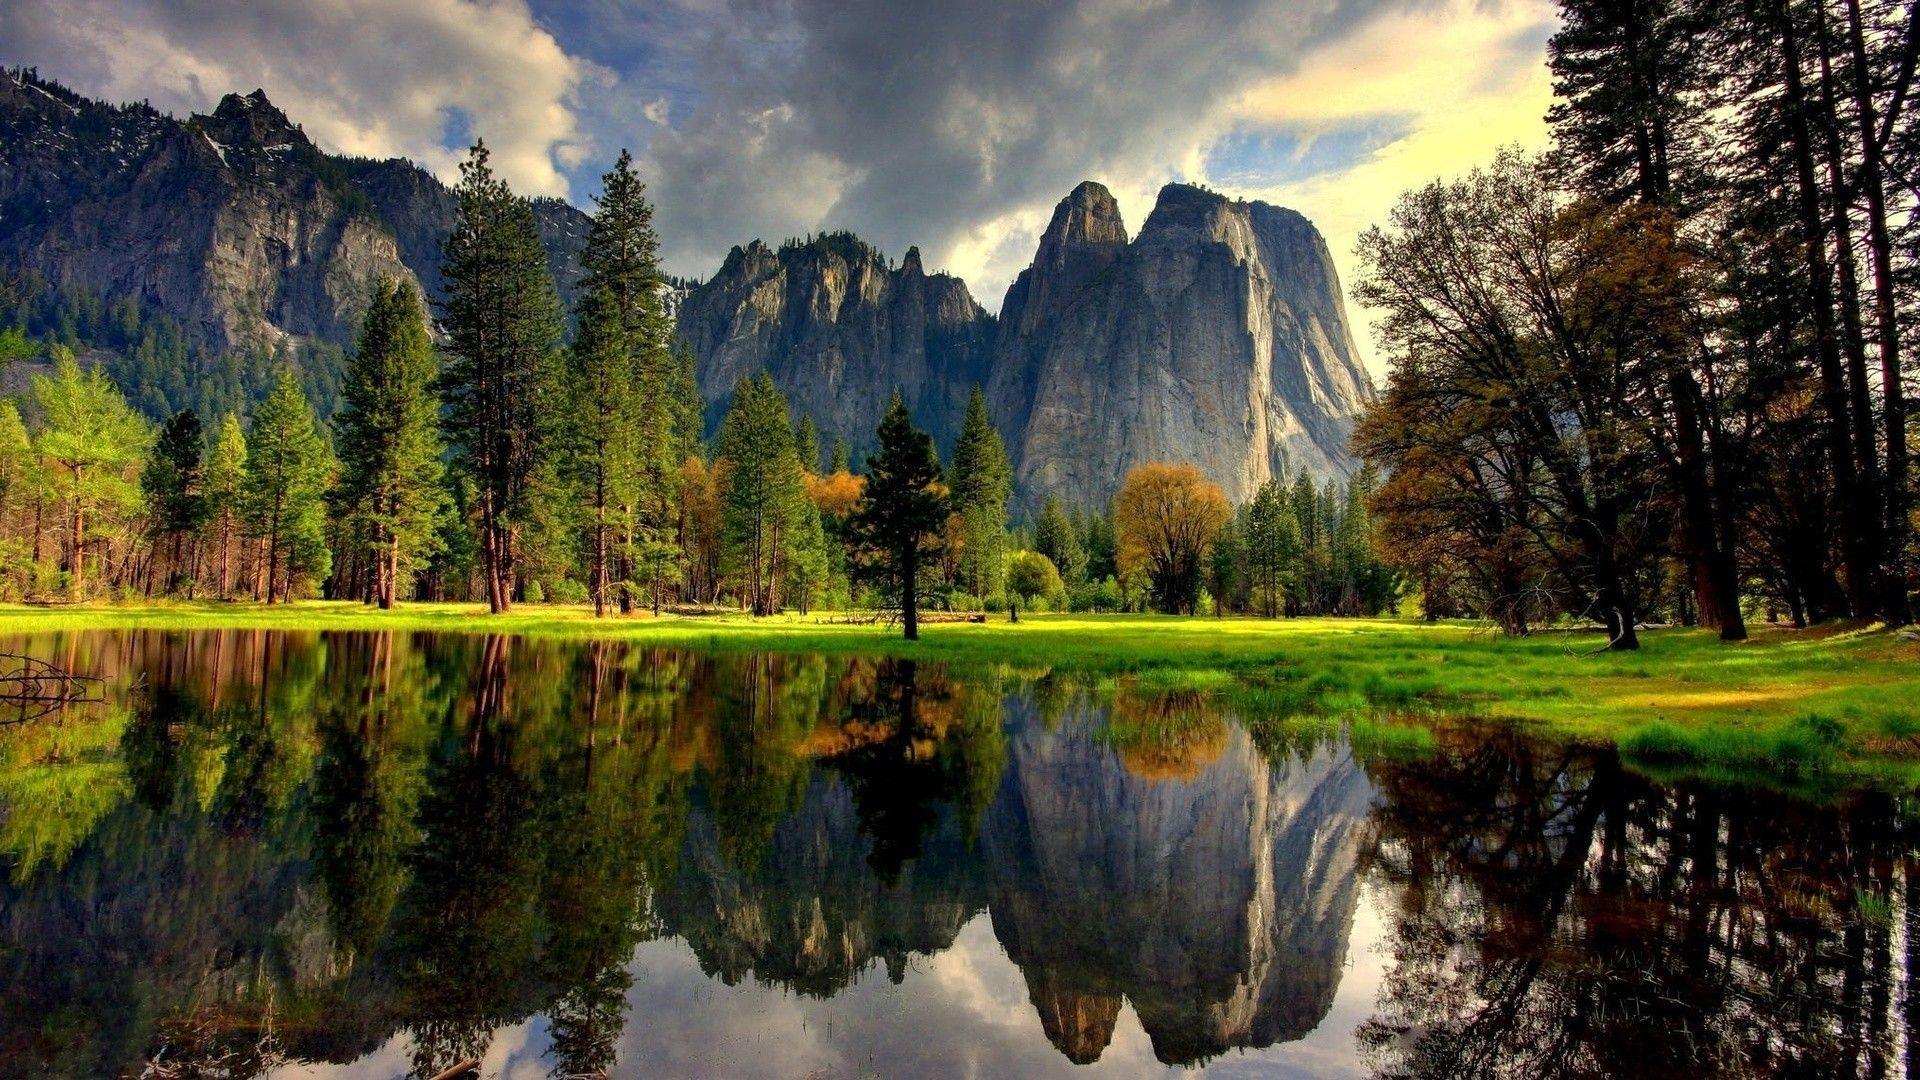 Yosemite Cool HD Wallpaper